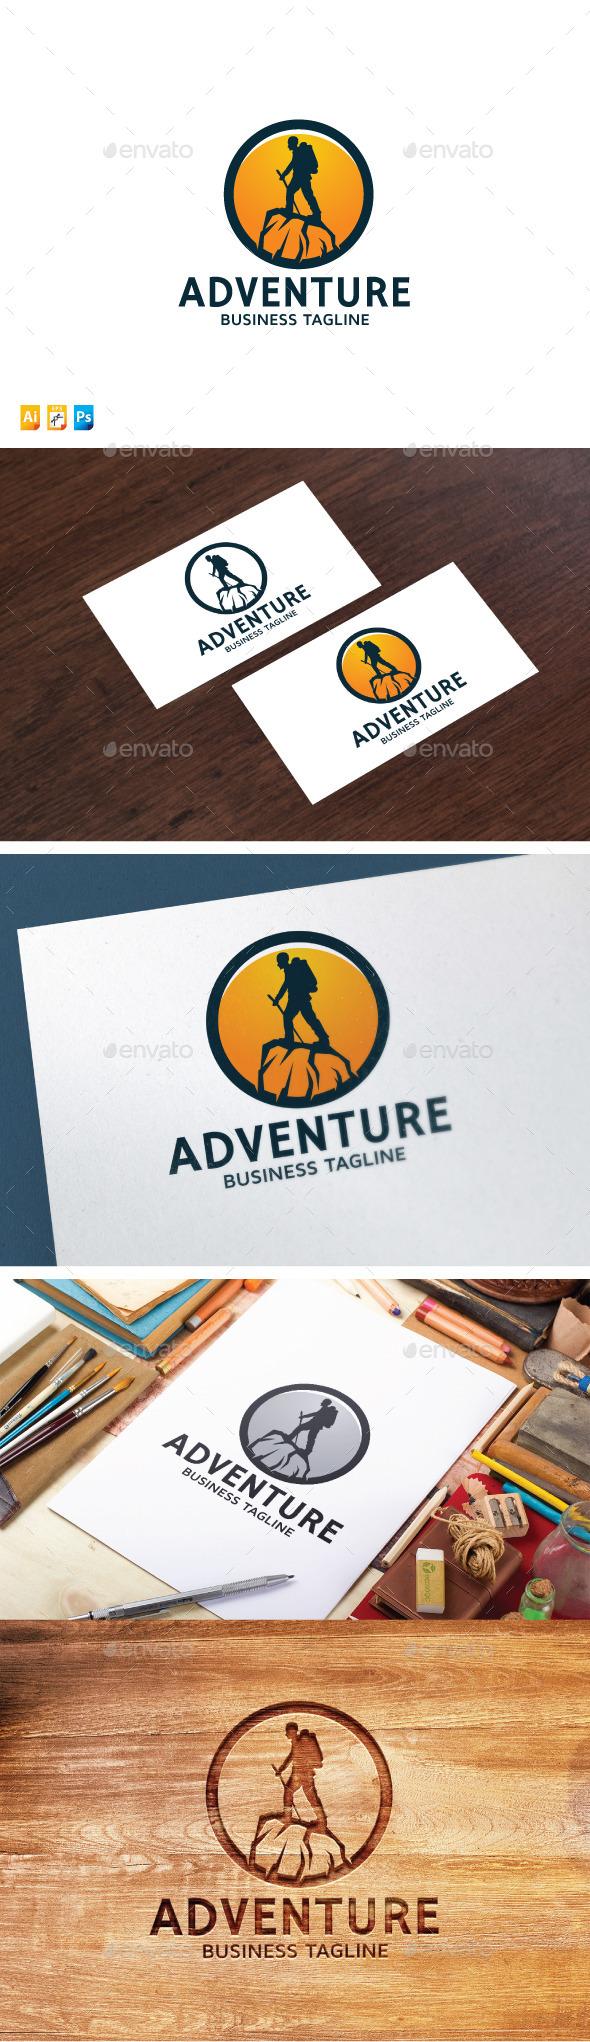 Traveller logo template